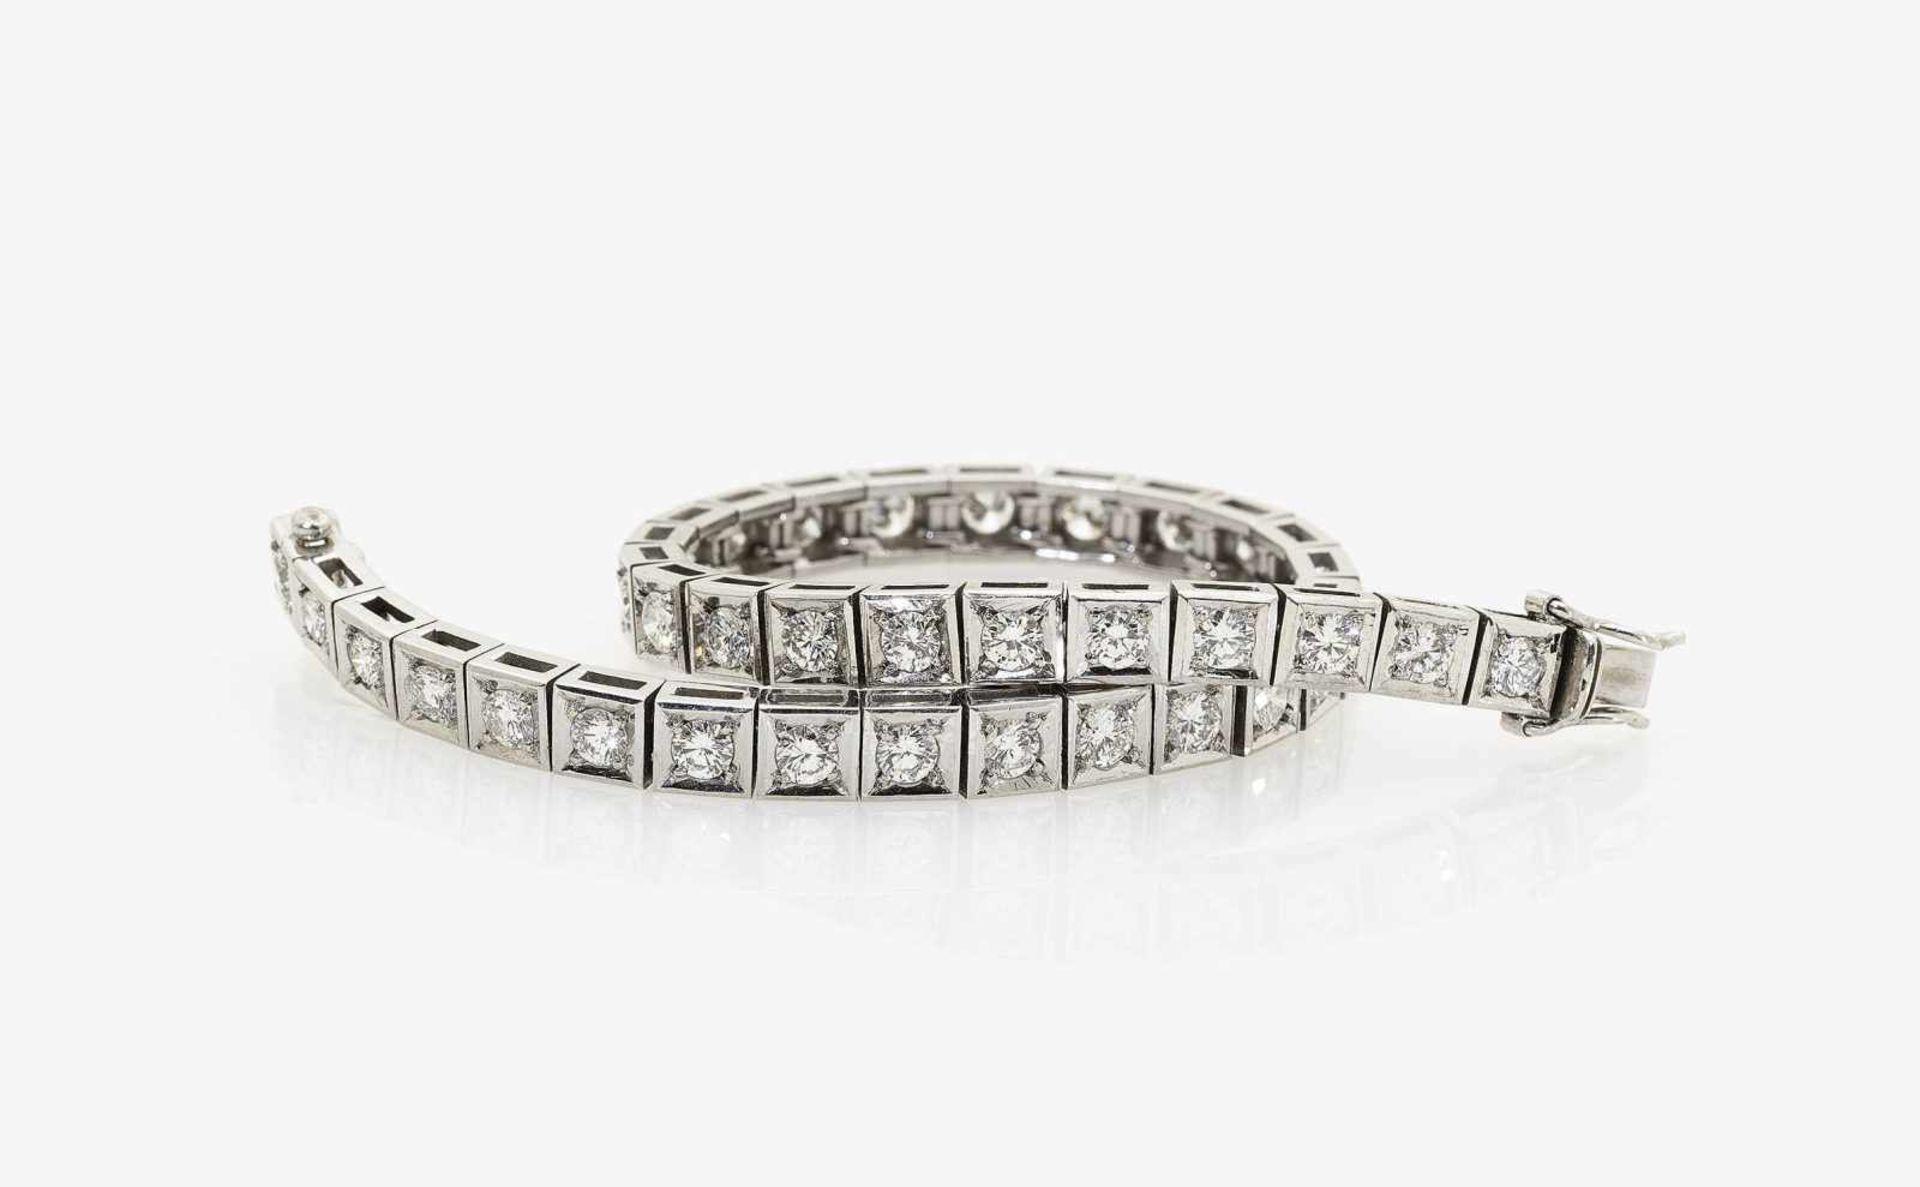 Los 1054 - A Diamond Tennis Bracelet